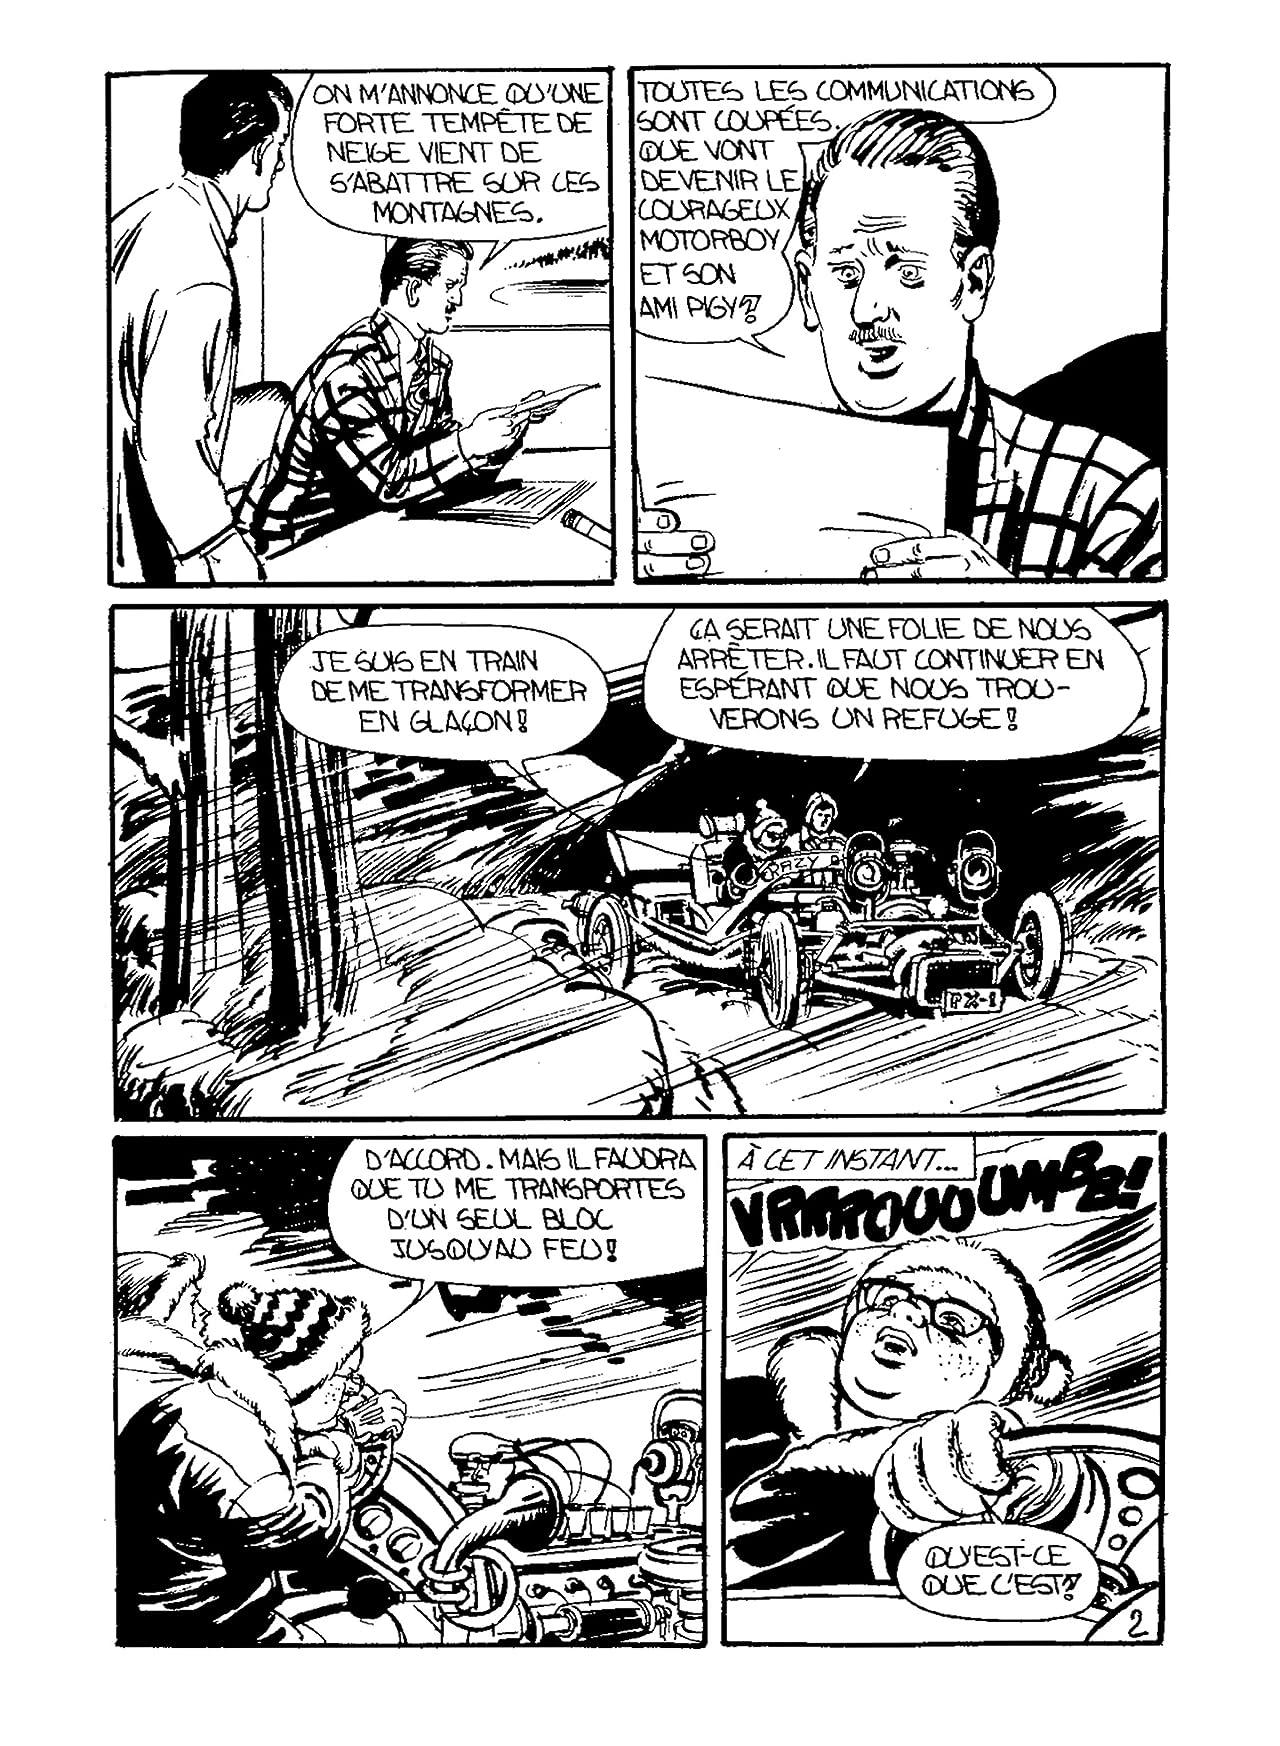 Motorboy #2: Les Chacals